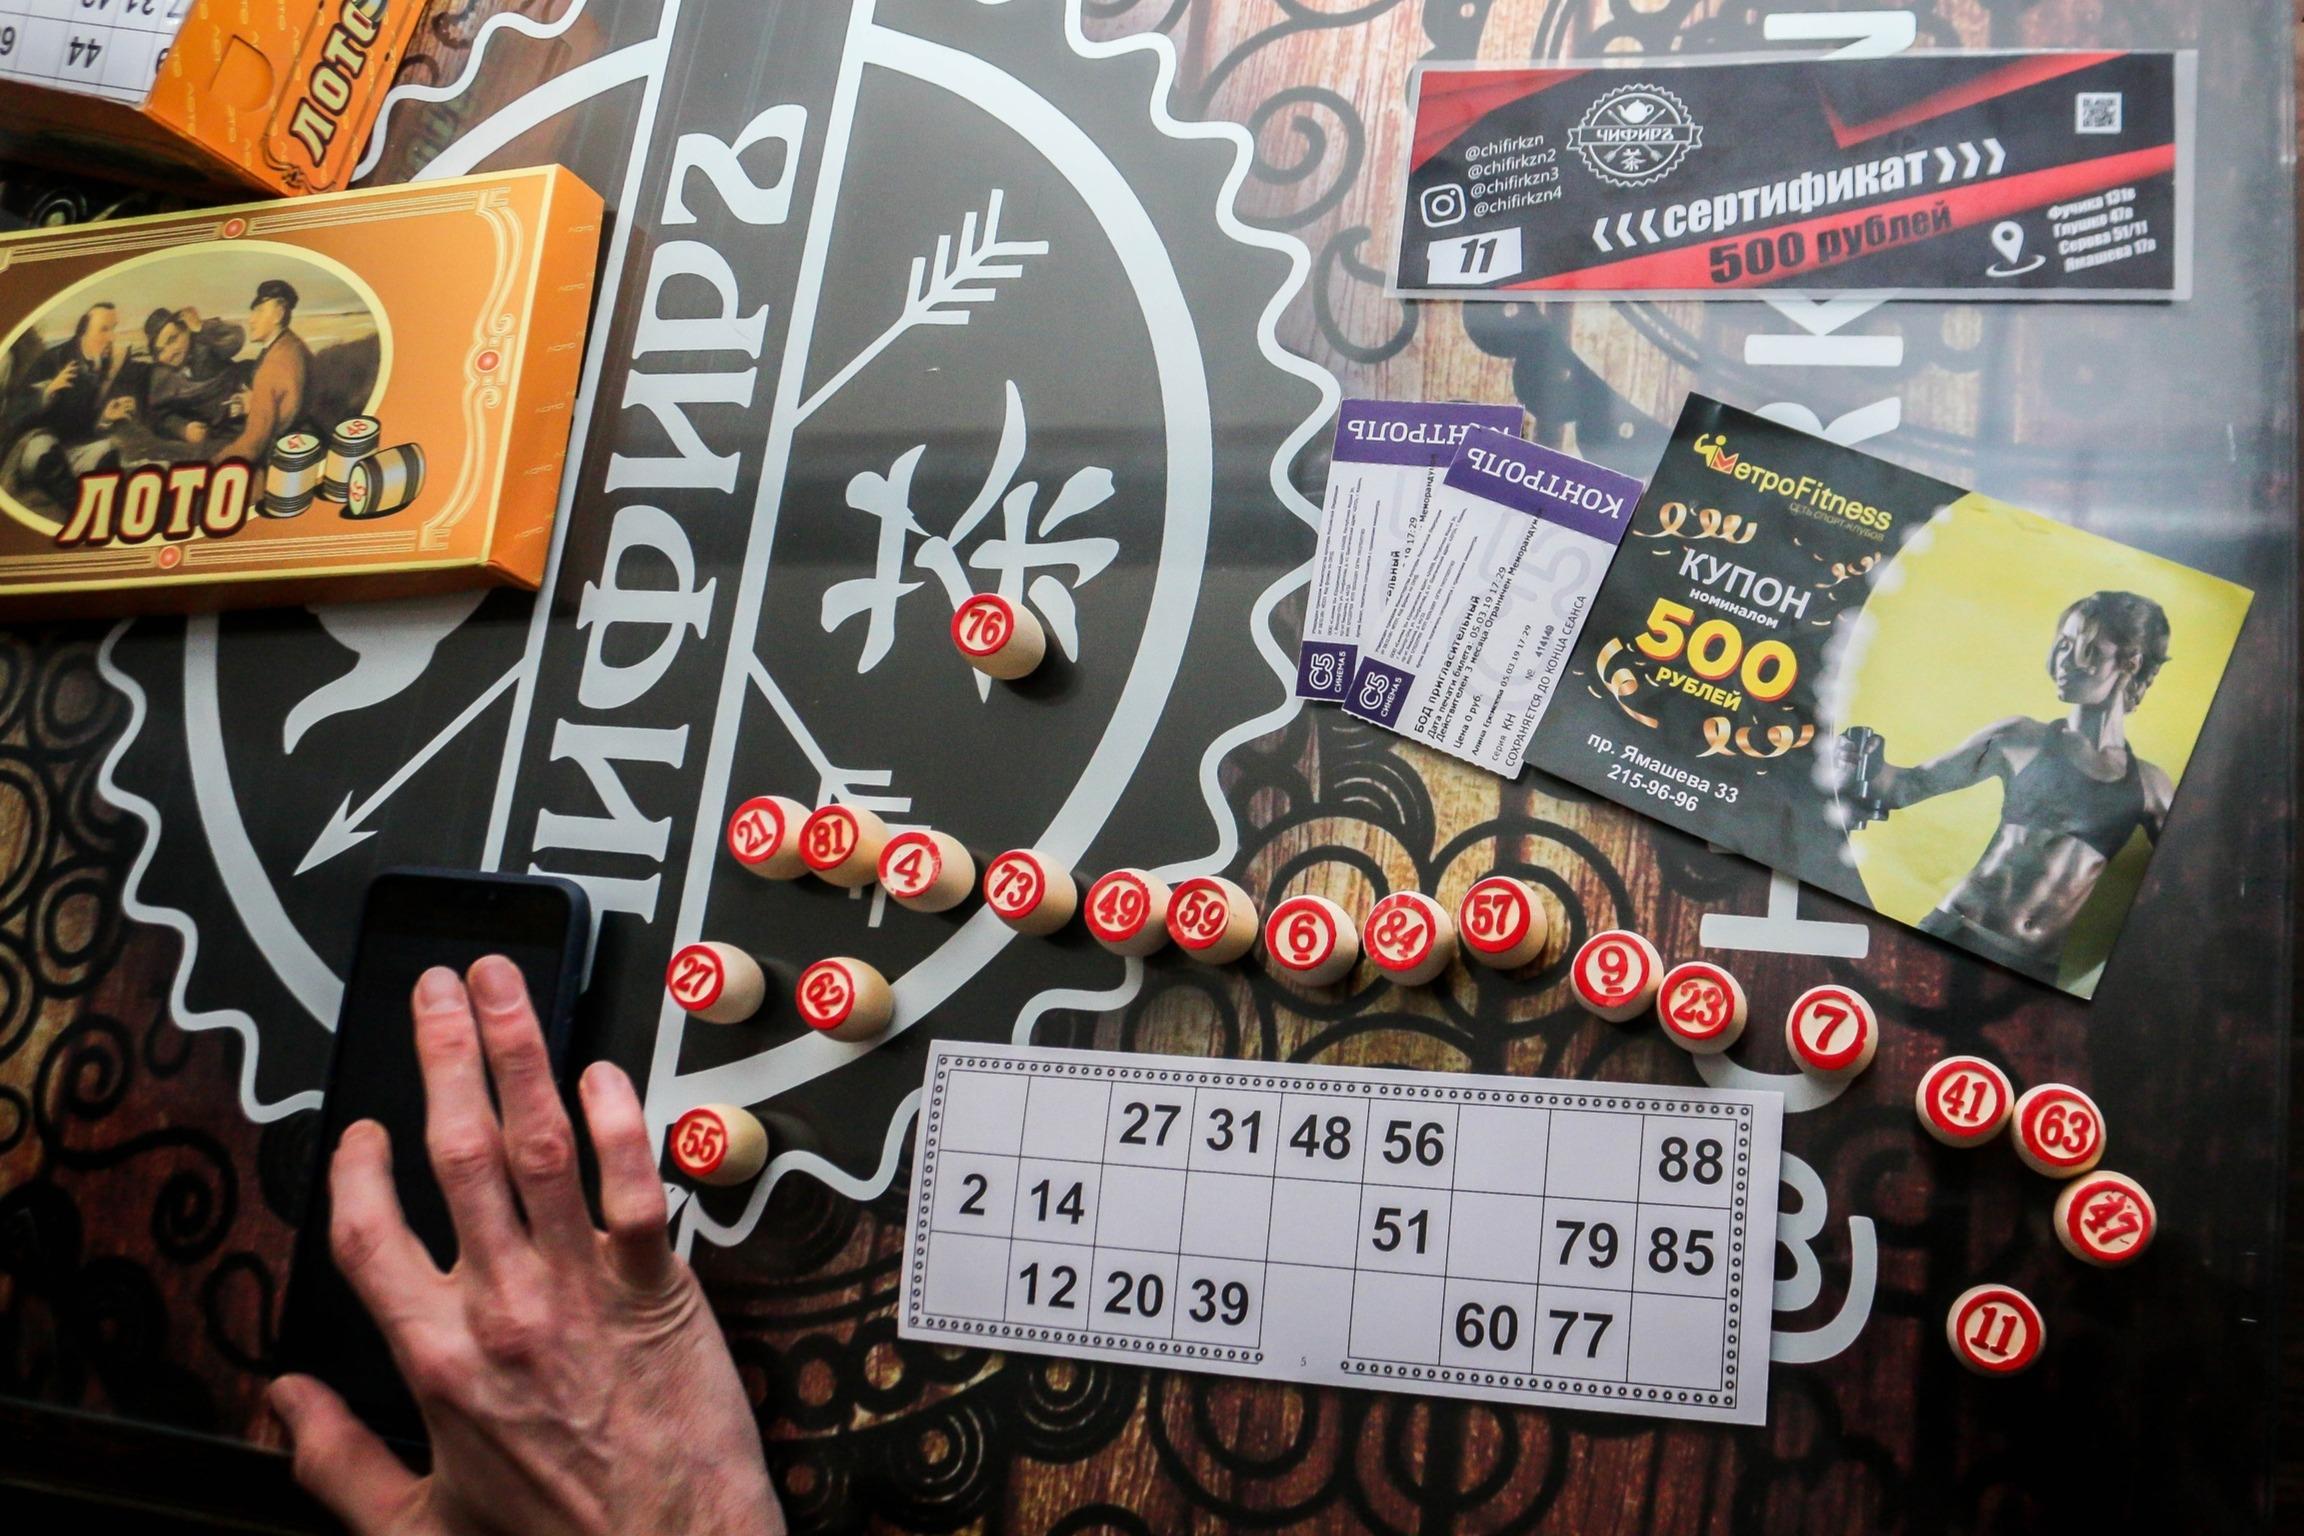 Lounge bar, кафе, кальянная, фастфуд «ЧИФИРЪ» - Вконтакте